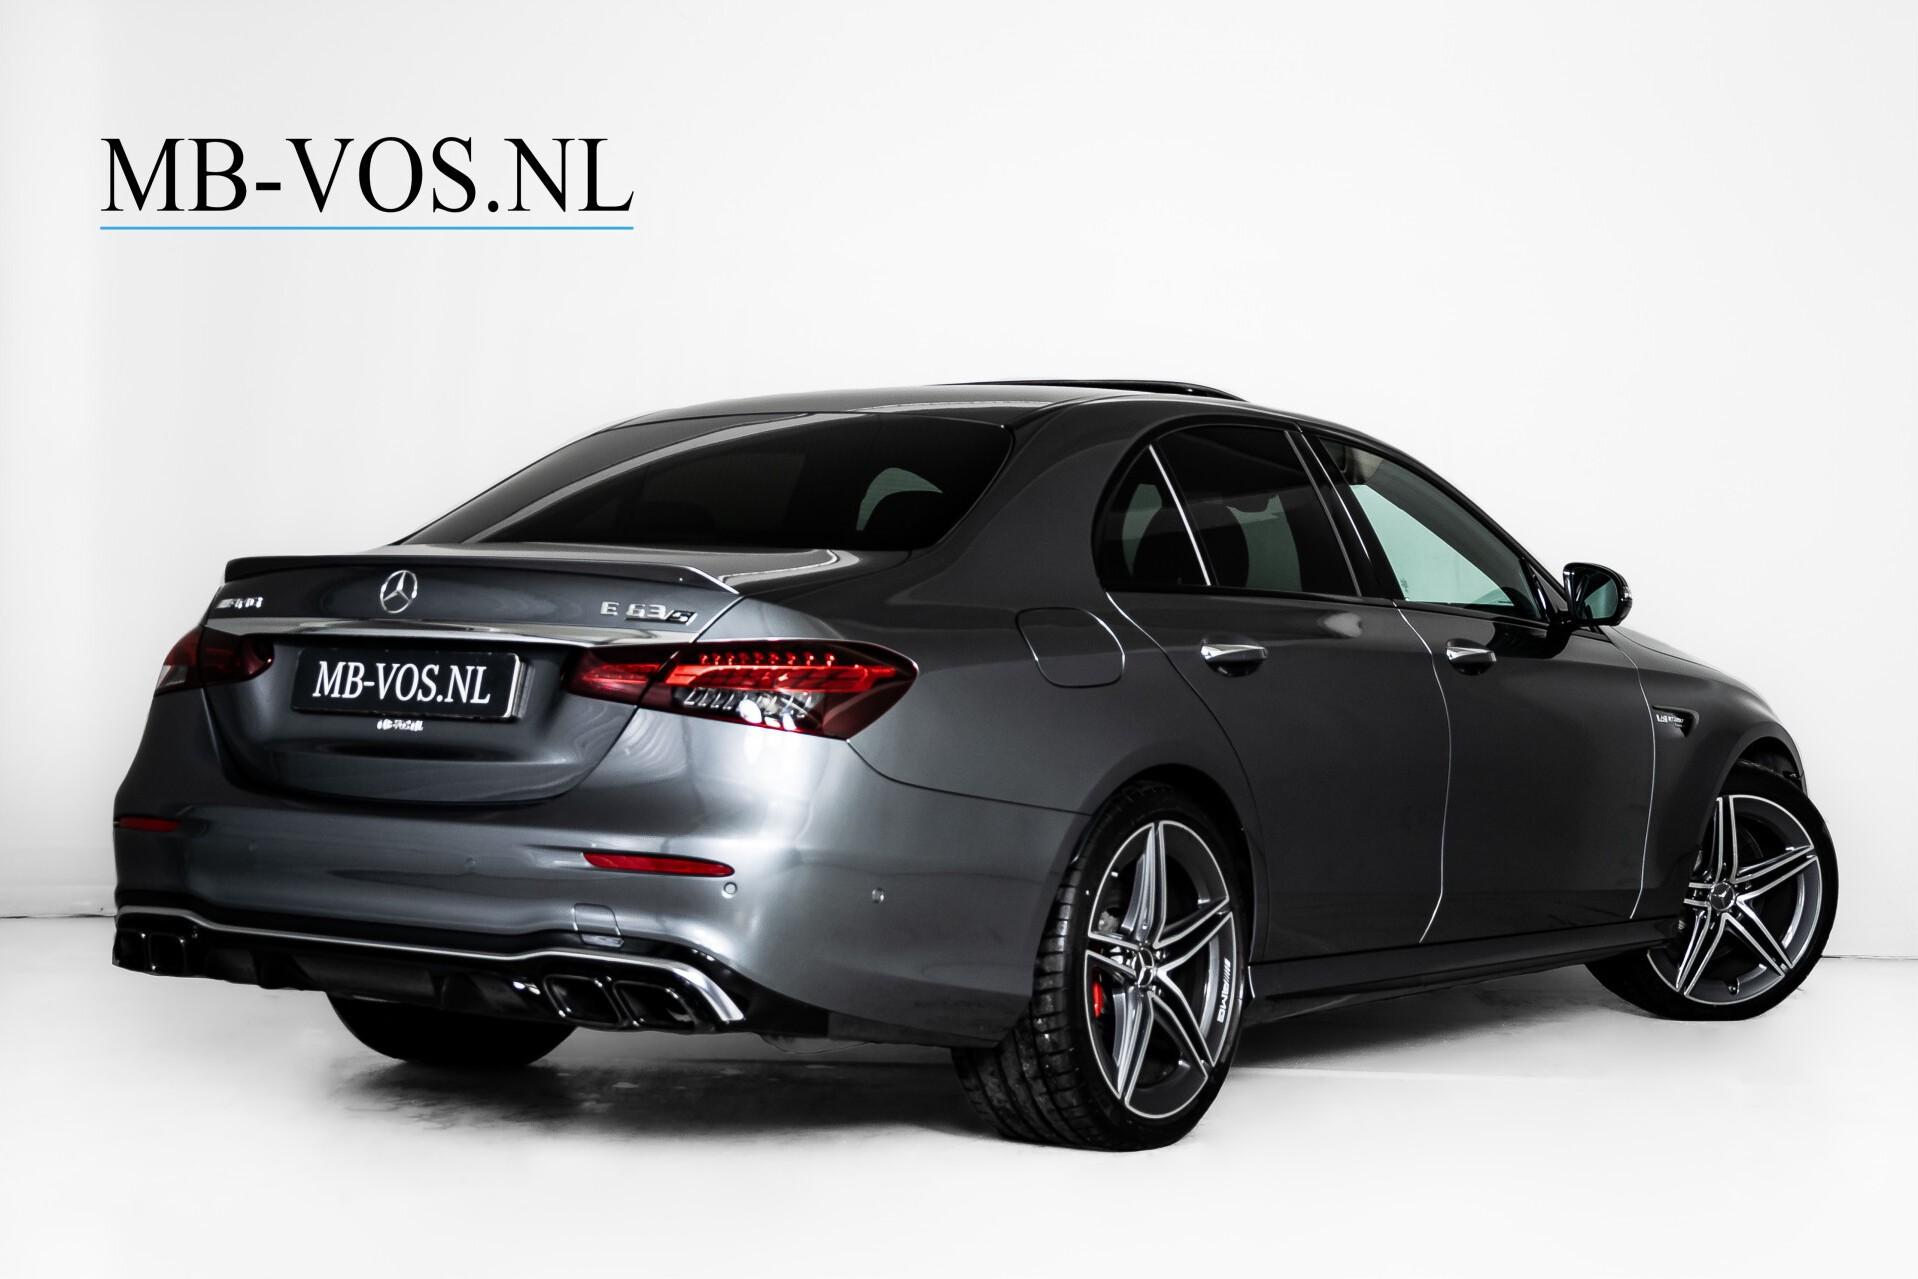 Mercedes-Benz E-Klasse 63 S AMG 4M+ NIEUW MODEL Night/Massage/Rij-assist/Keyless/Hud Aut9 Foto 2